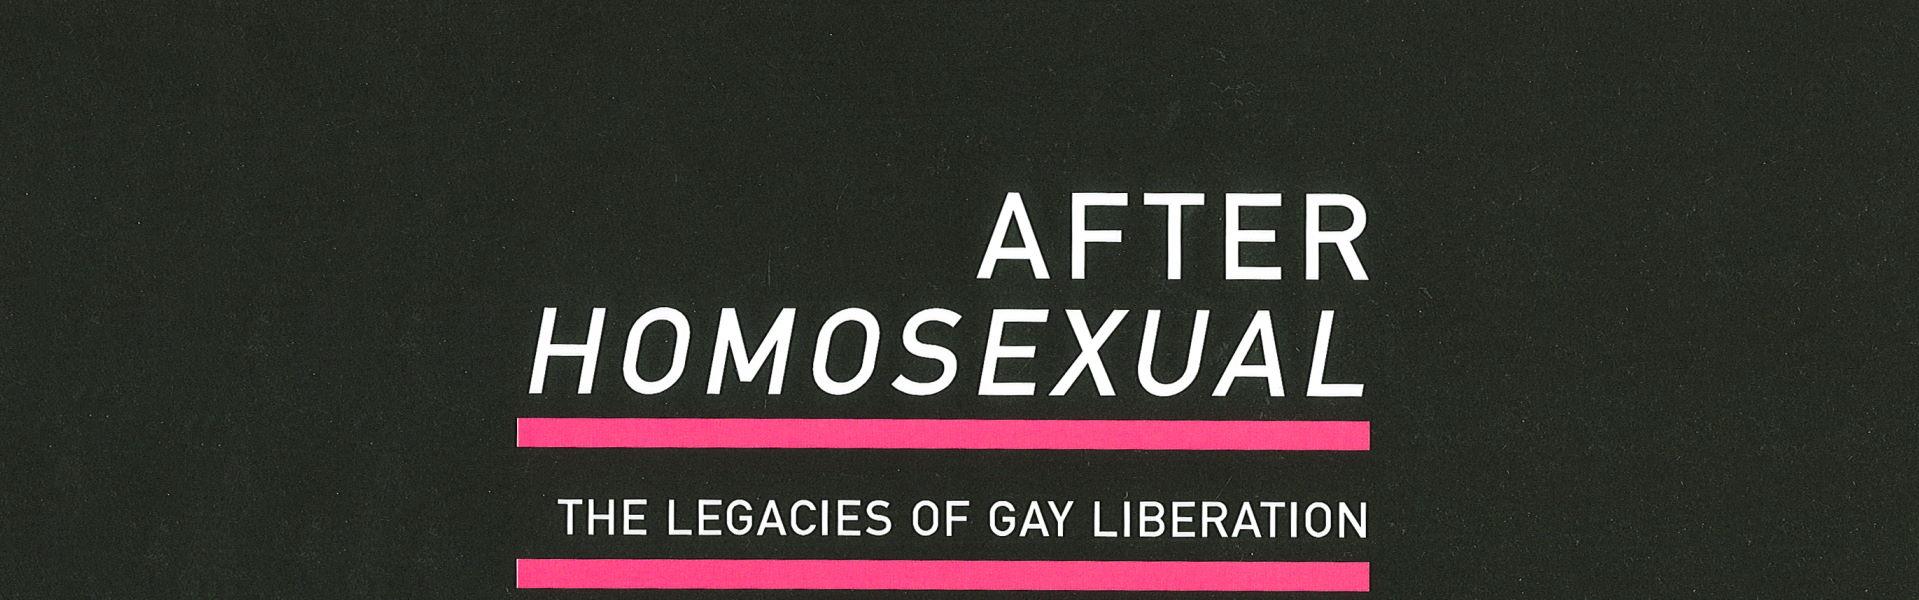 After homosexual : the legacies of gay liberation / edited by Carolyn D'Cruz and Mark Pendleton (Crawley, WA : UWA Publishing, 2013)